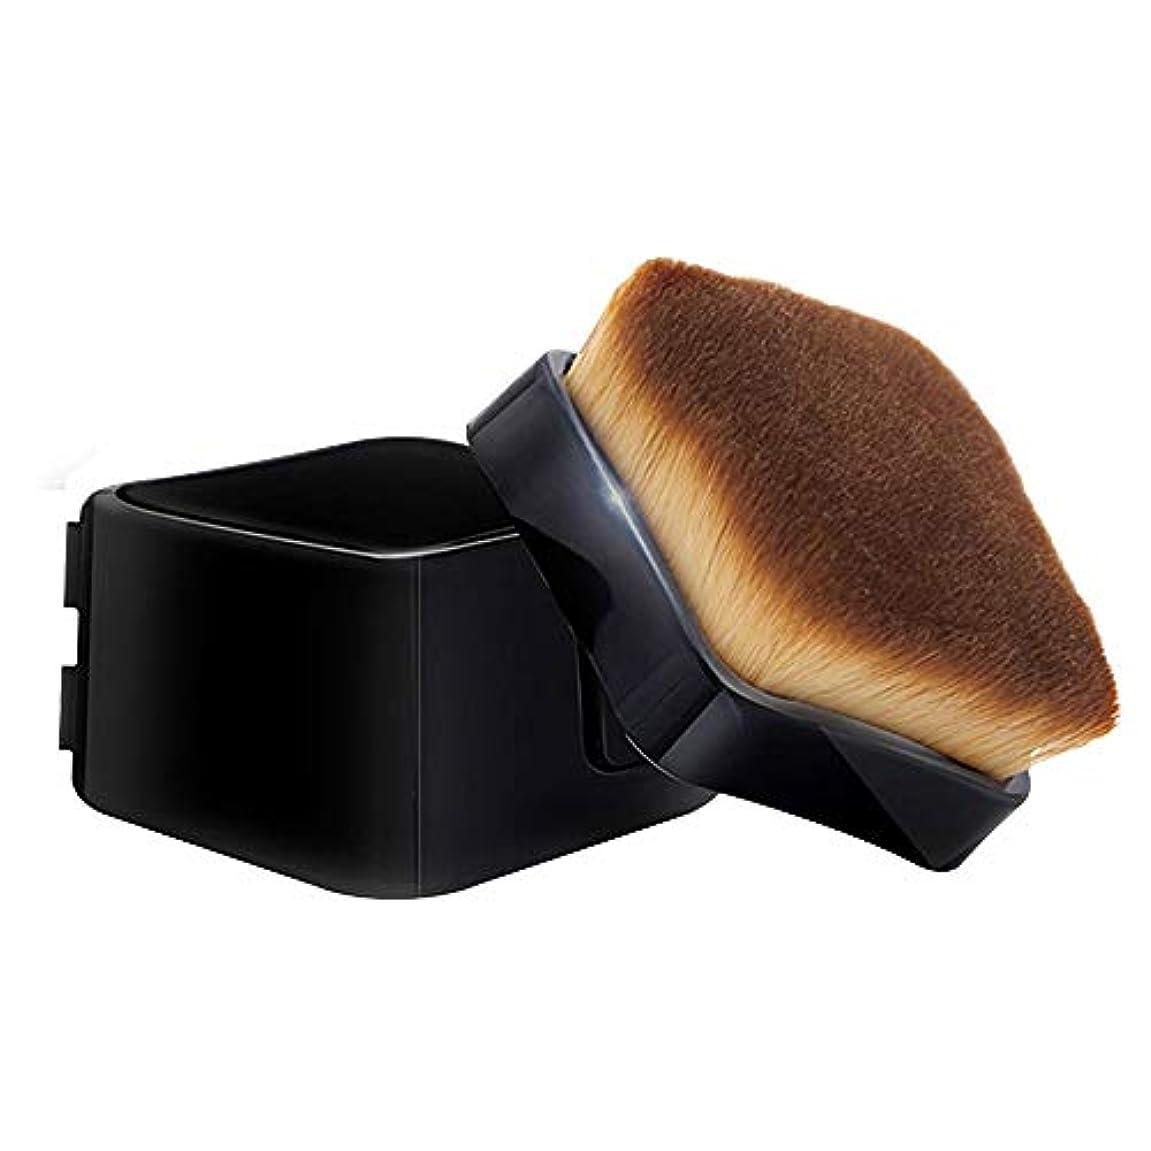 Esubara メイクブラシ ファンデーションブラシ 化粧筆 フェイスブラシ 柔らかい毛